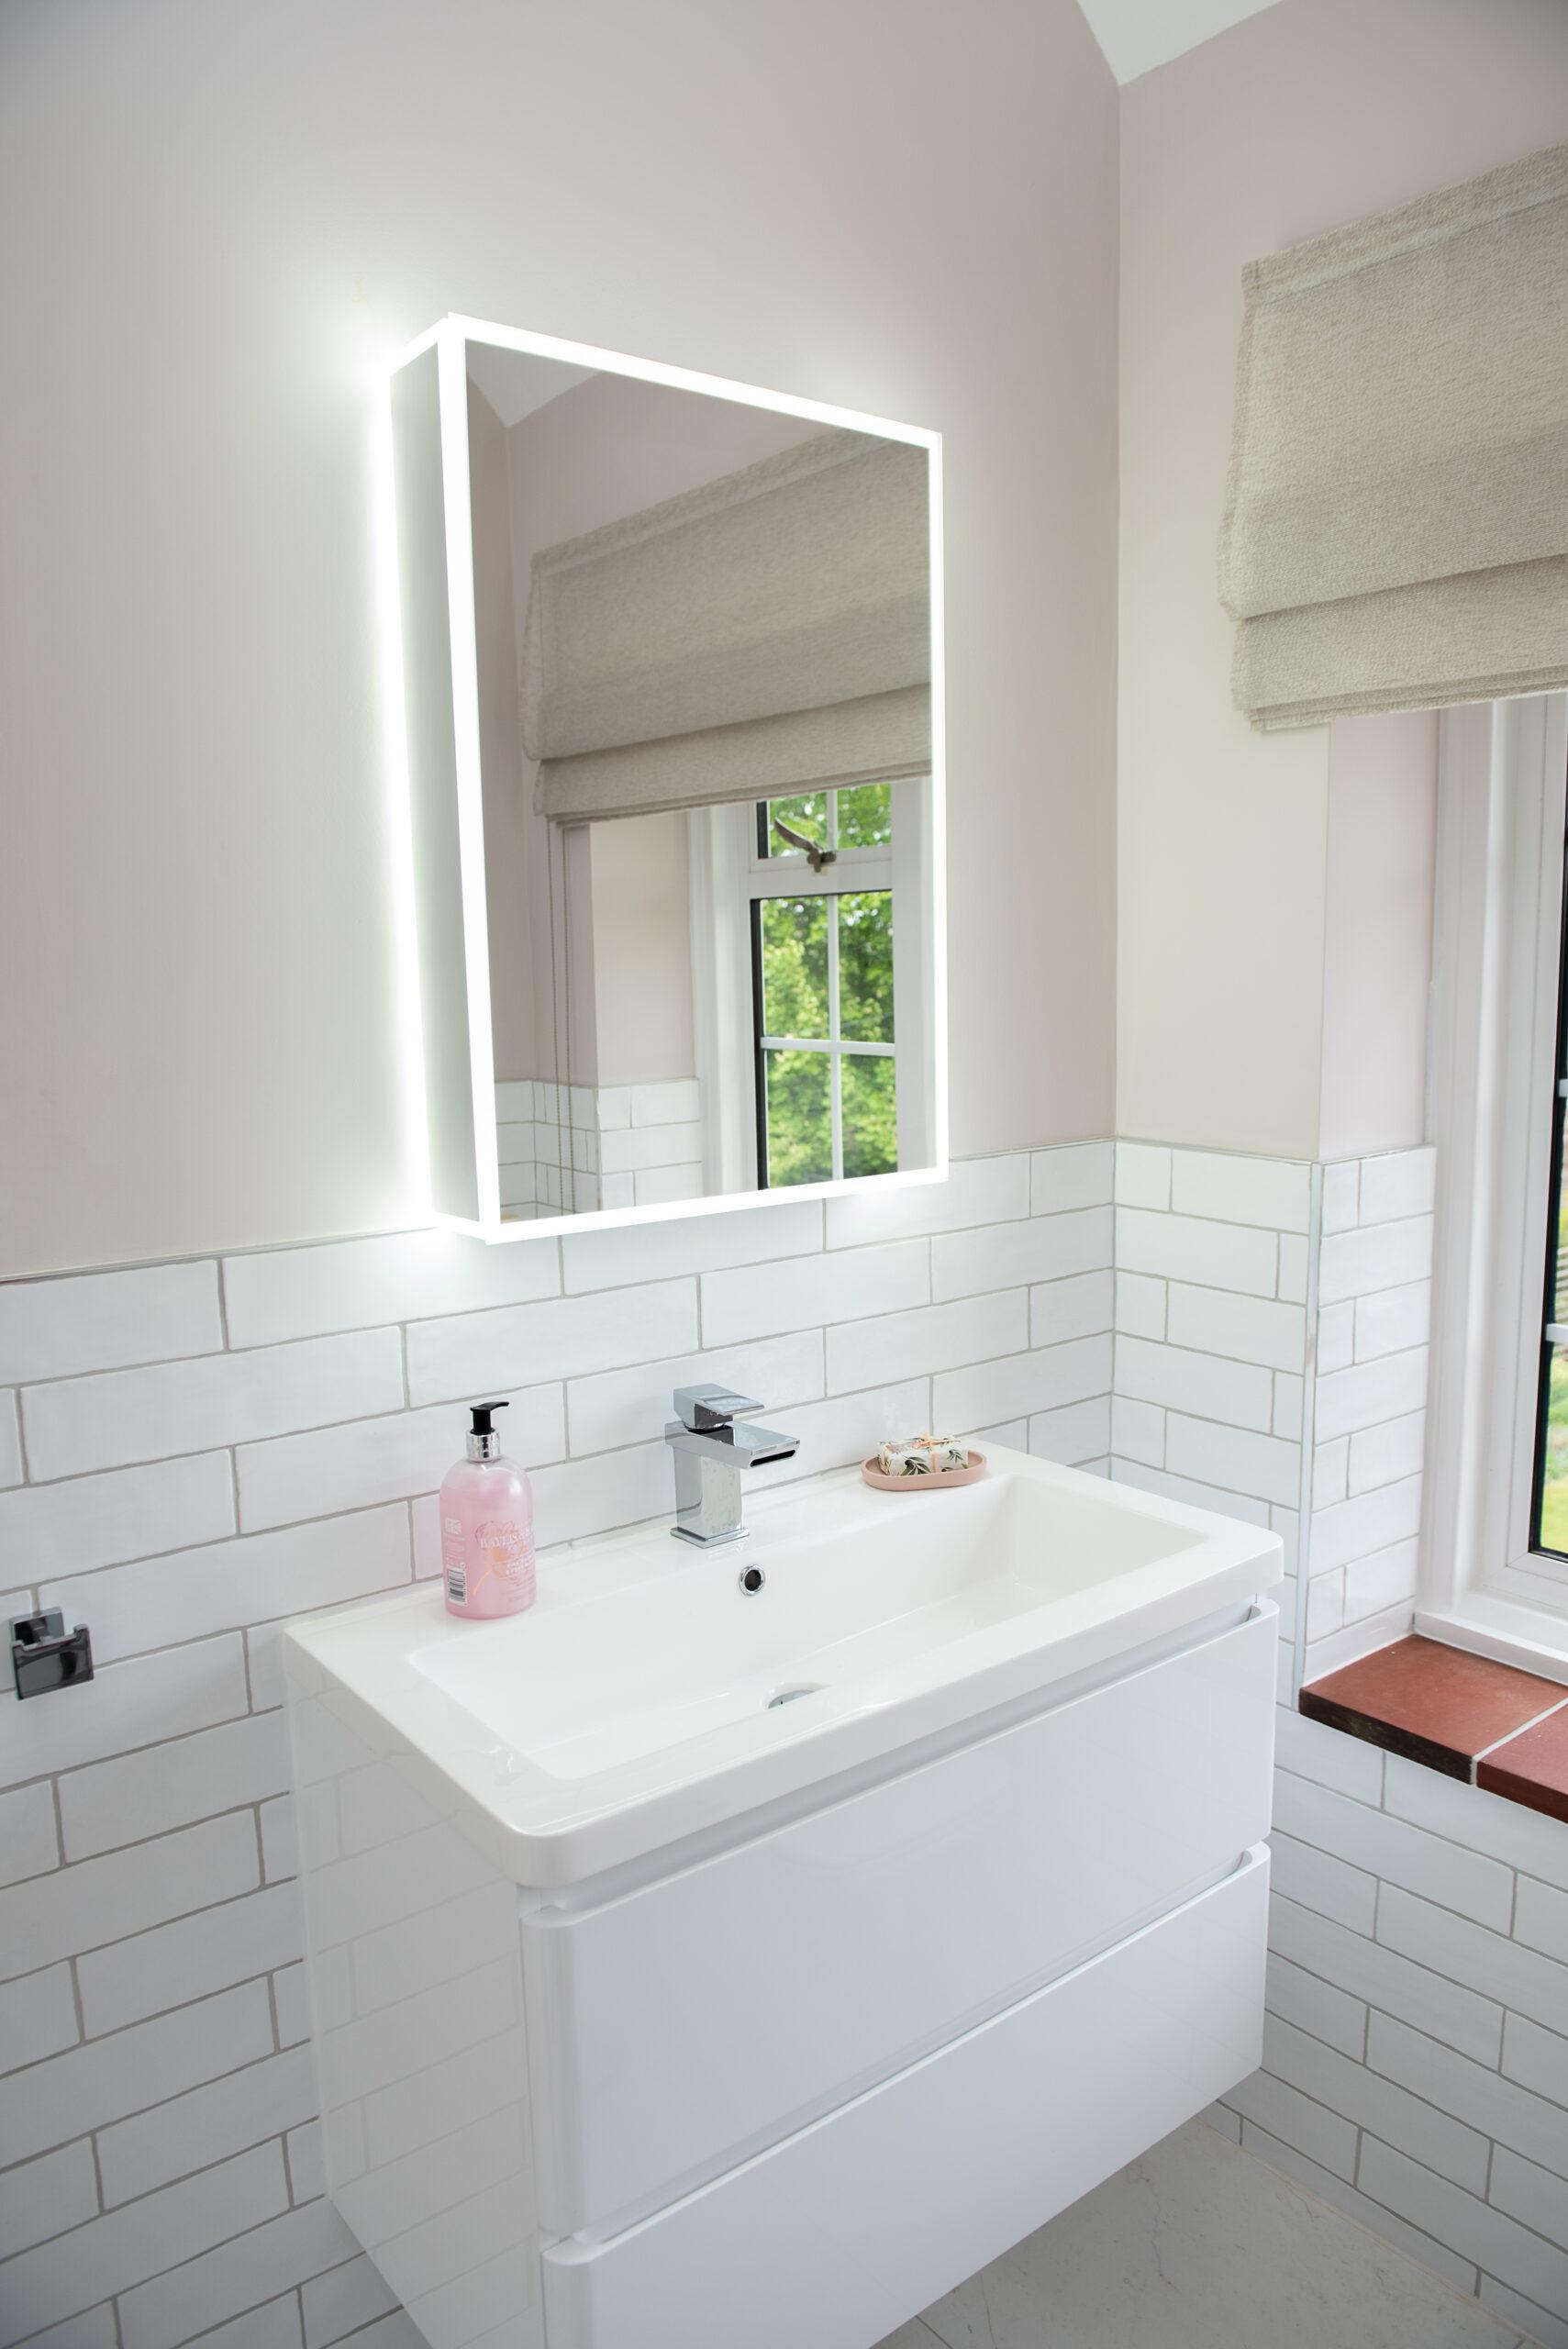 Fairways Goring Ensuite Bathroom Sink and Mirror